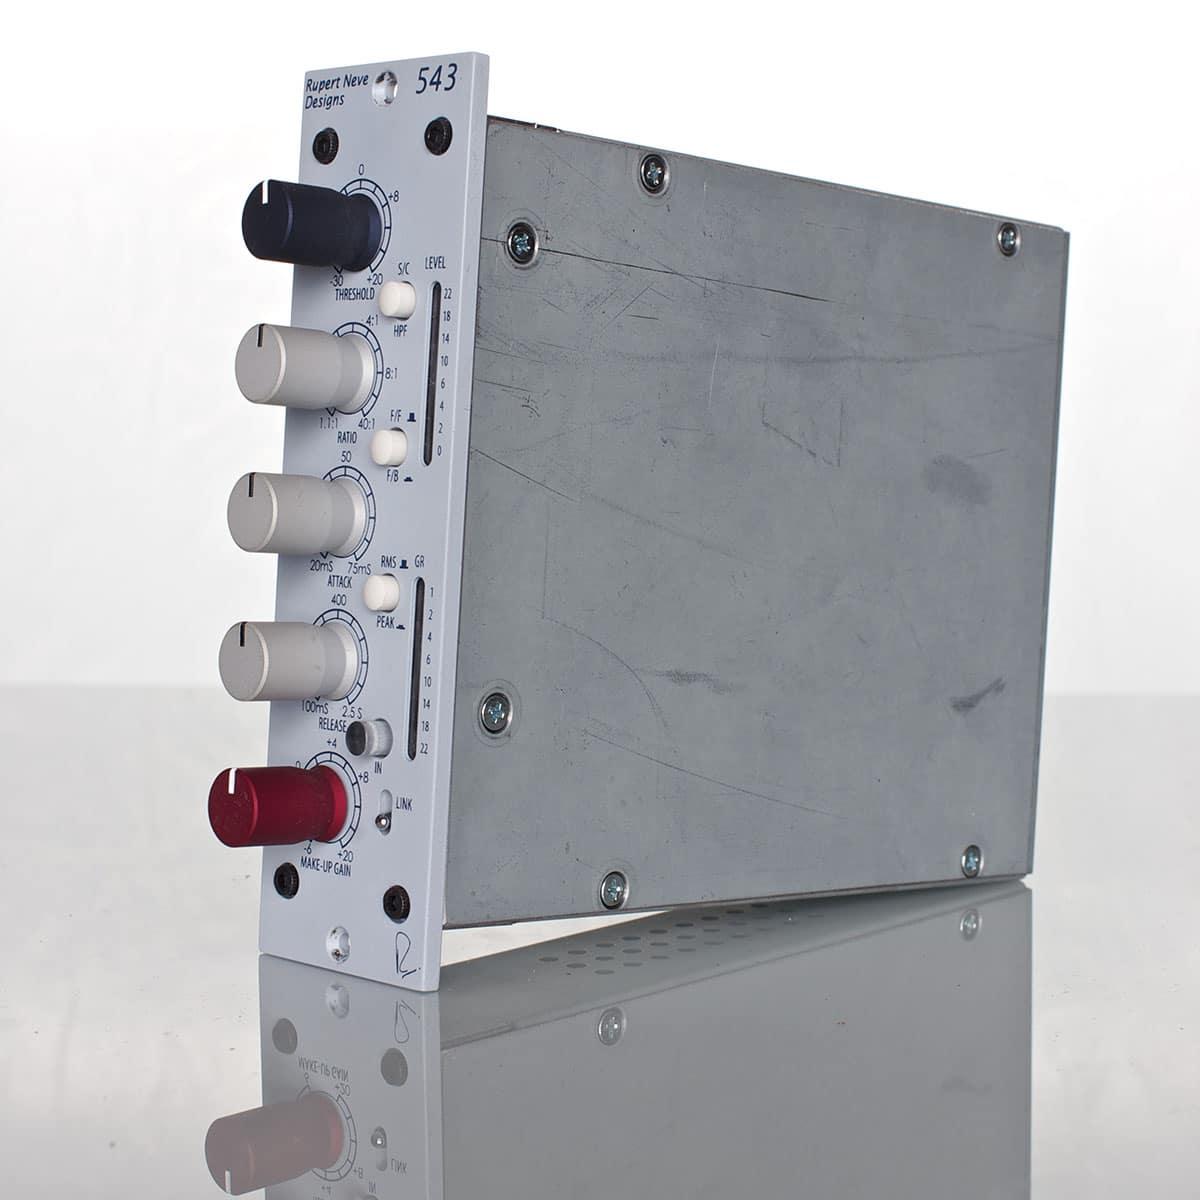 Rupert Neve 543 02 Pro Audio, Outboard, Compressori